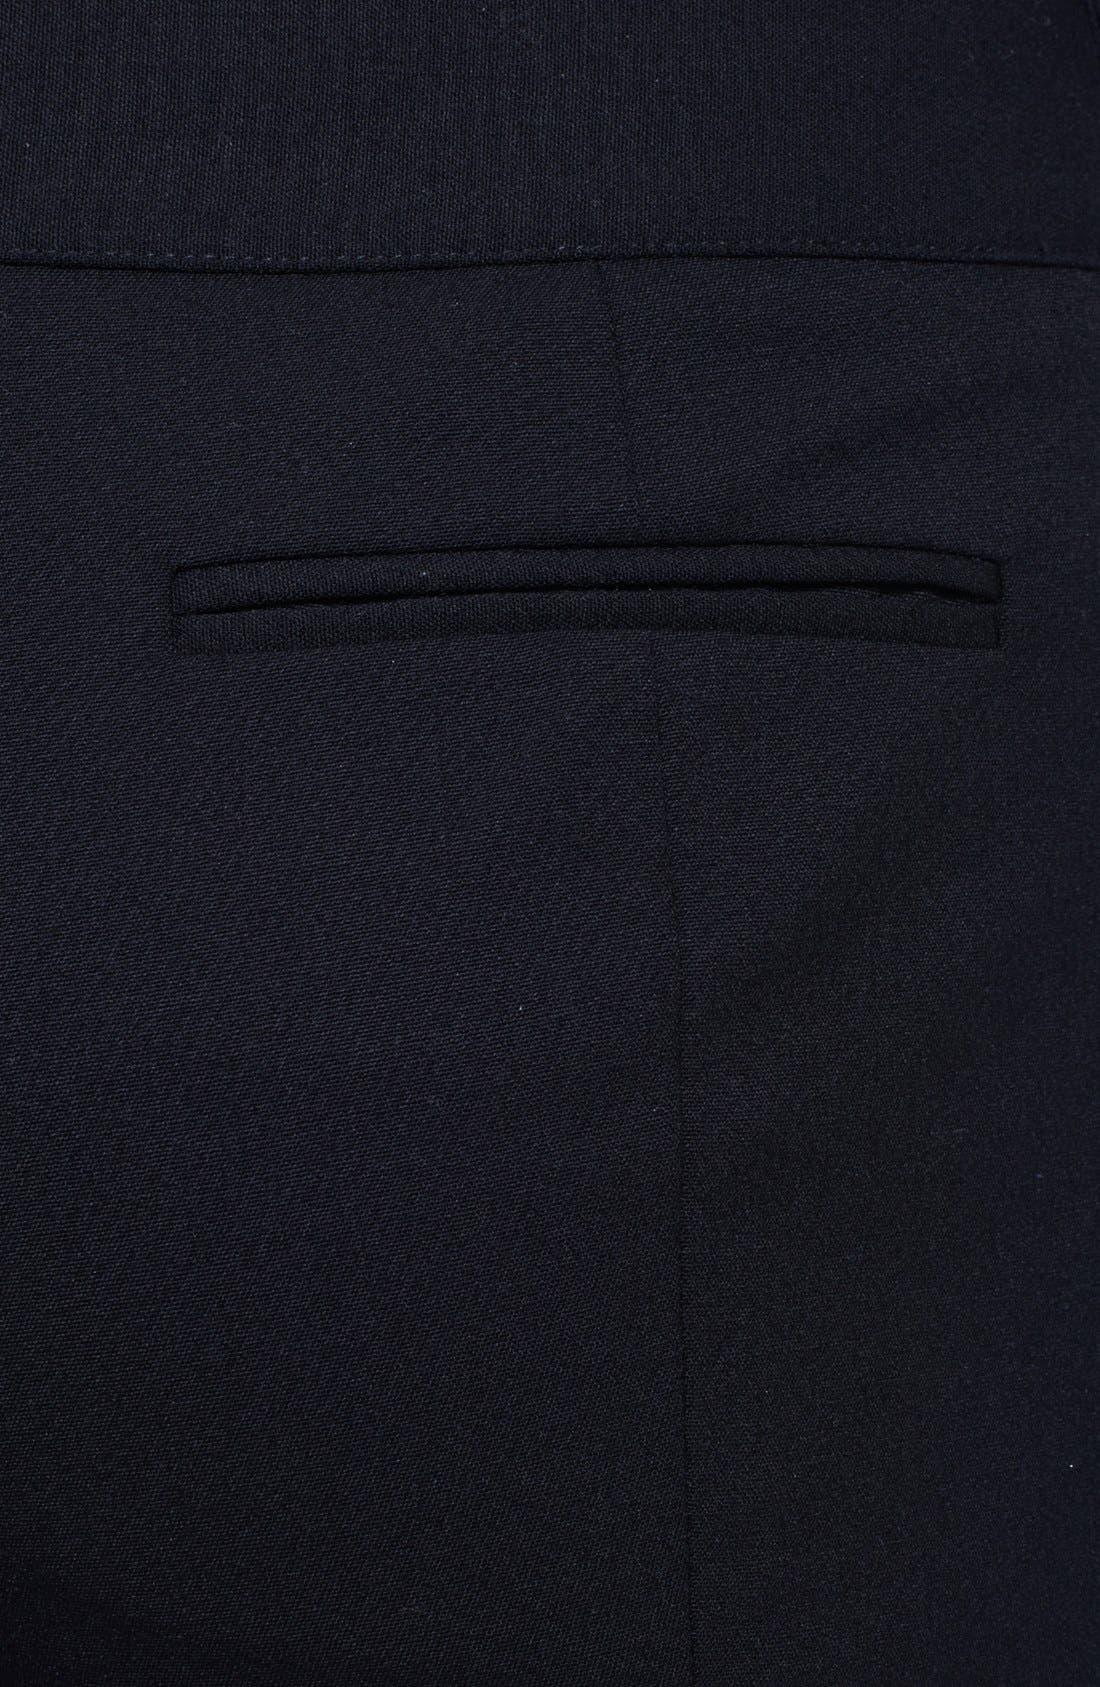 Alternate Image 3  - Jason Wu Wool Blend Utility Pants